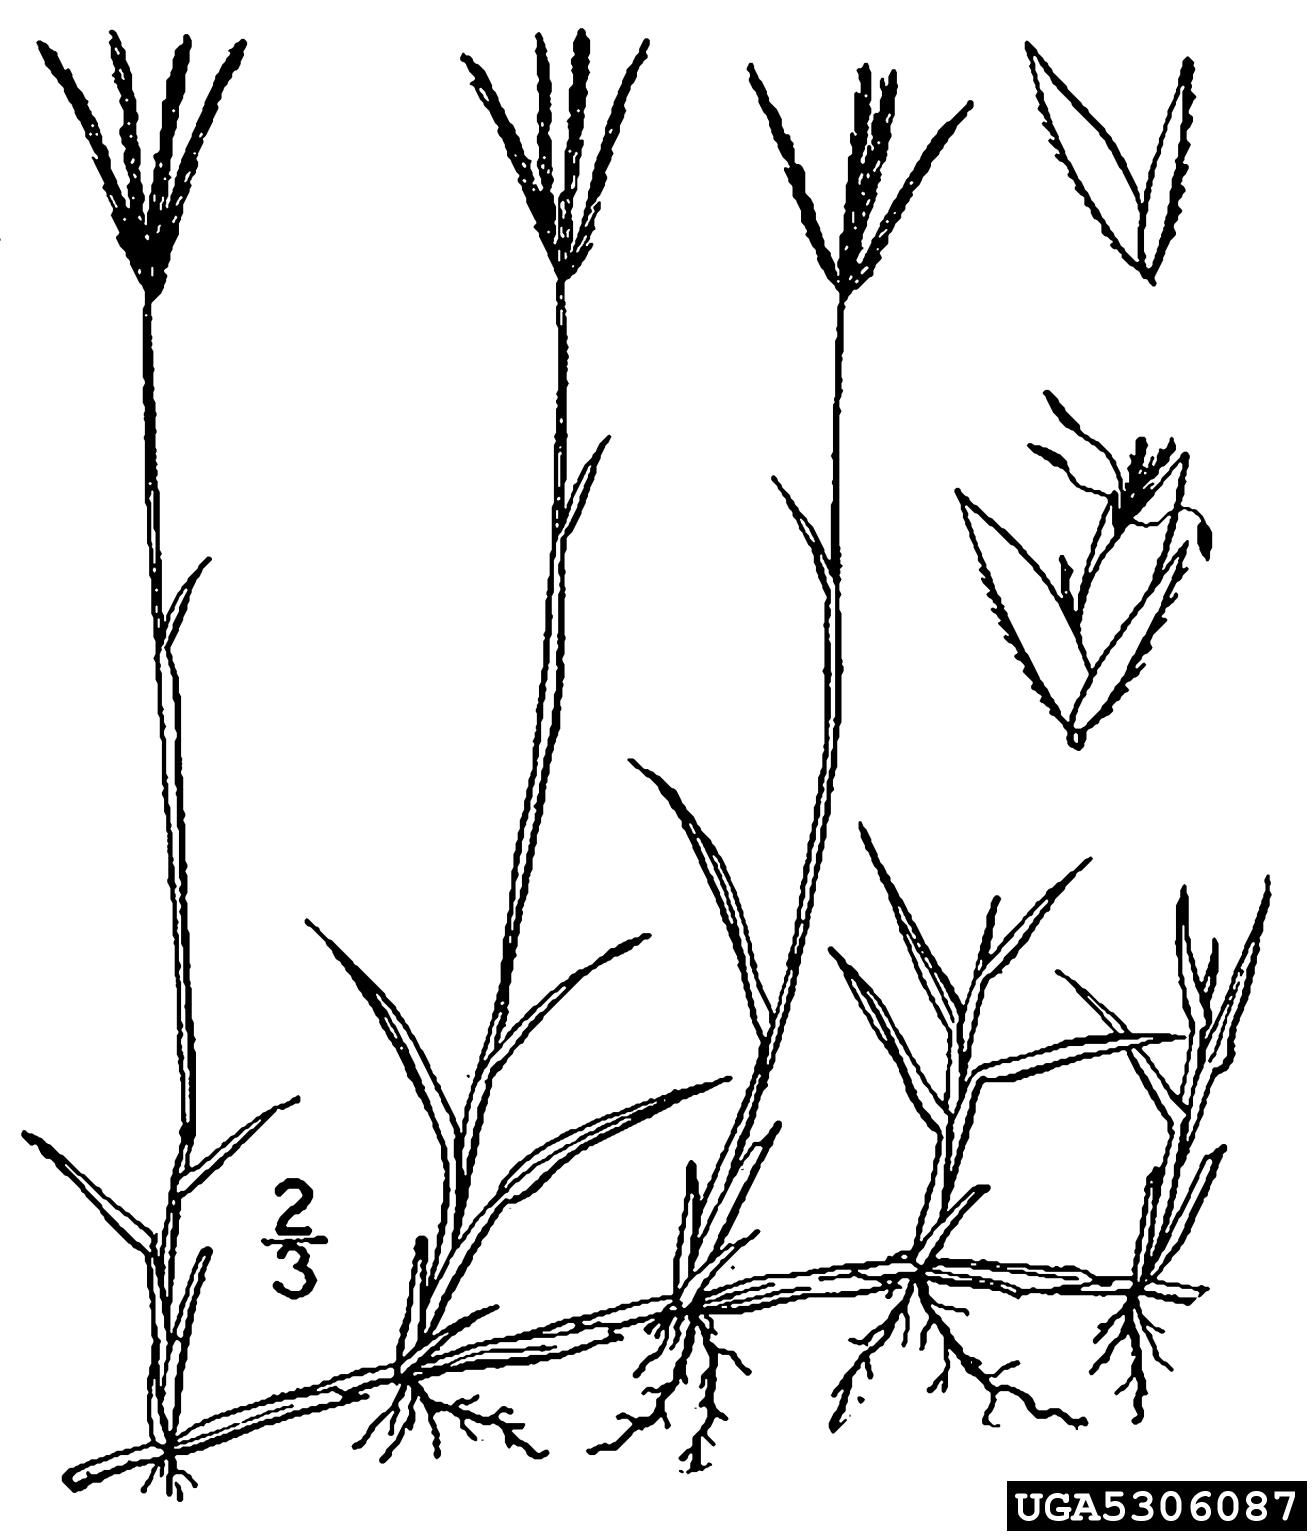 Bermudagrass Cynodon Dactylon Cyperales Poaceae